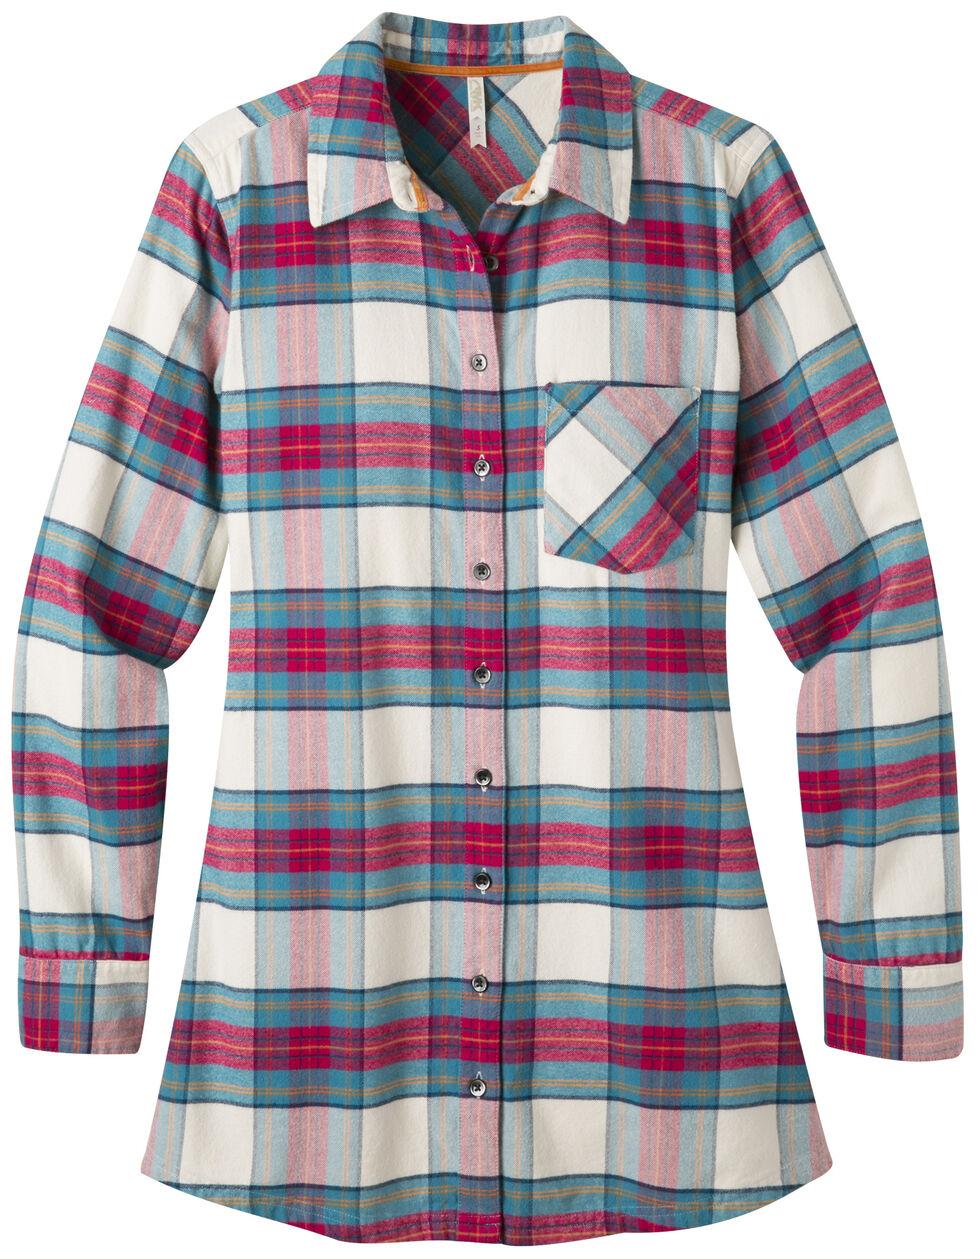 Mountain Khakis Women's Penny Plaid Tunic Shirt, Cream, hi-res